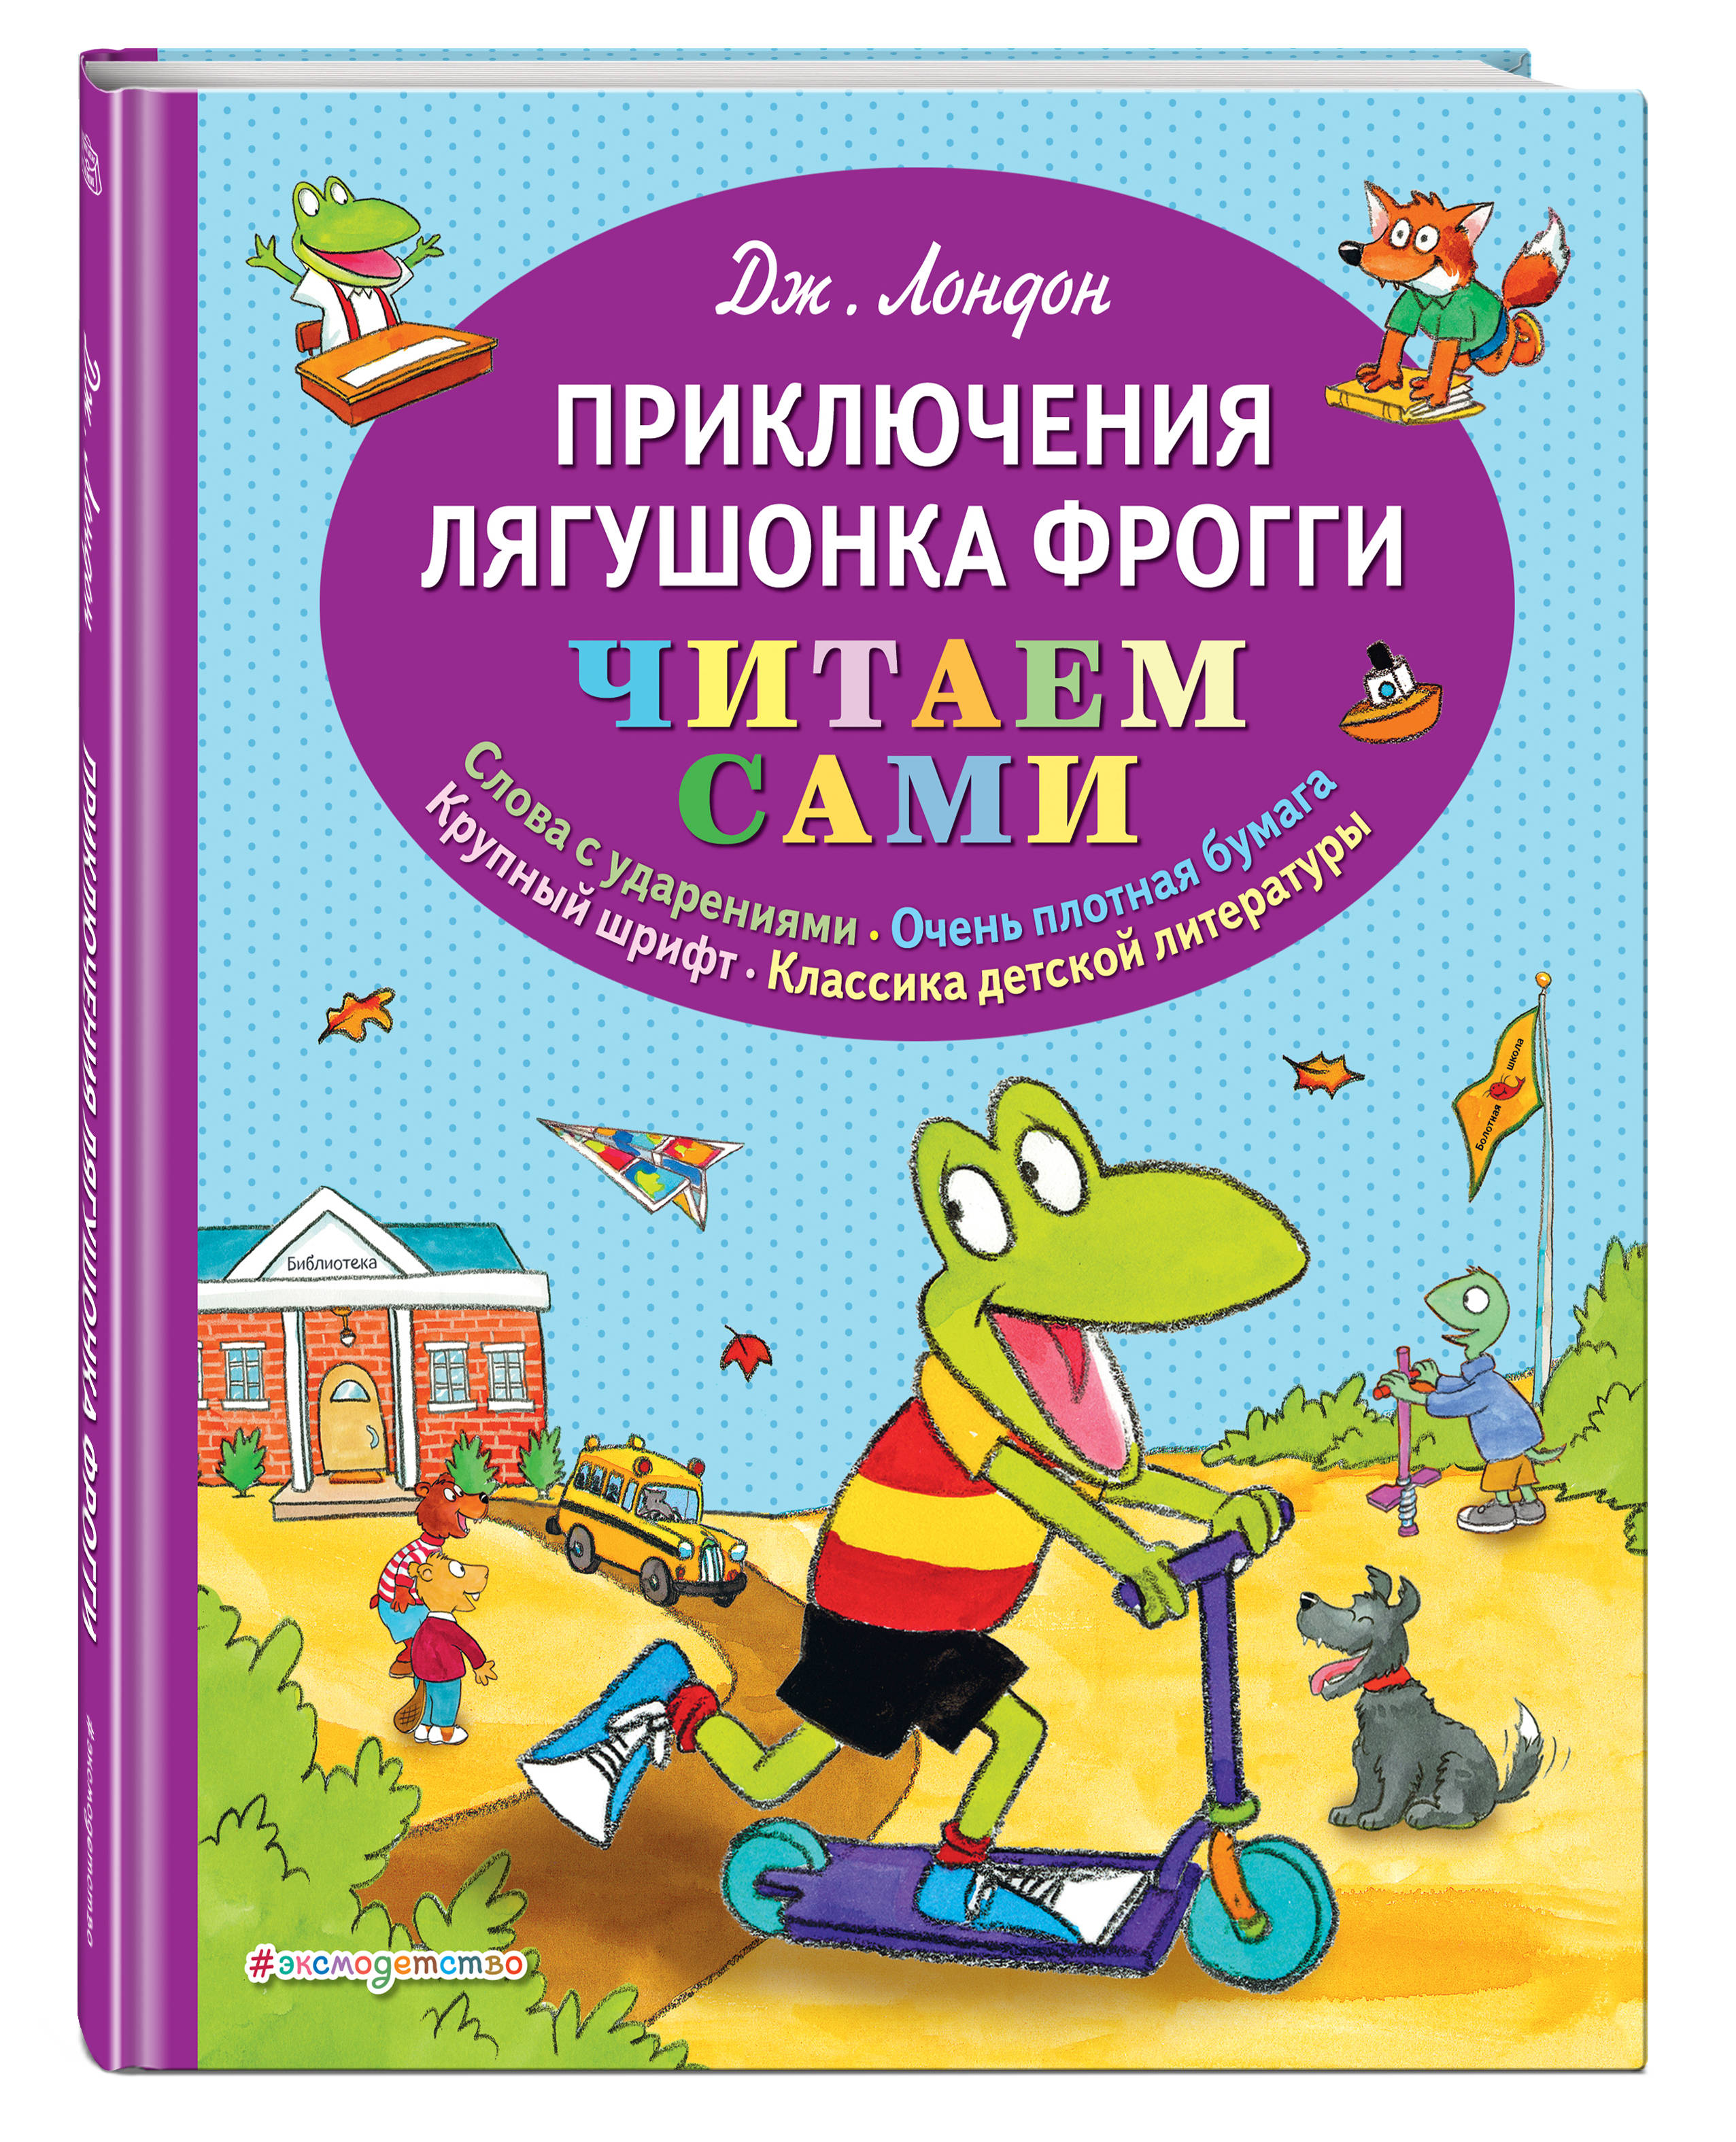 Джонатан Лондон Приключения лягушонка Фрогги джонатан лондон приключения лягушонка фрогги